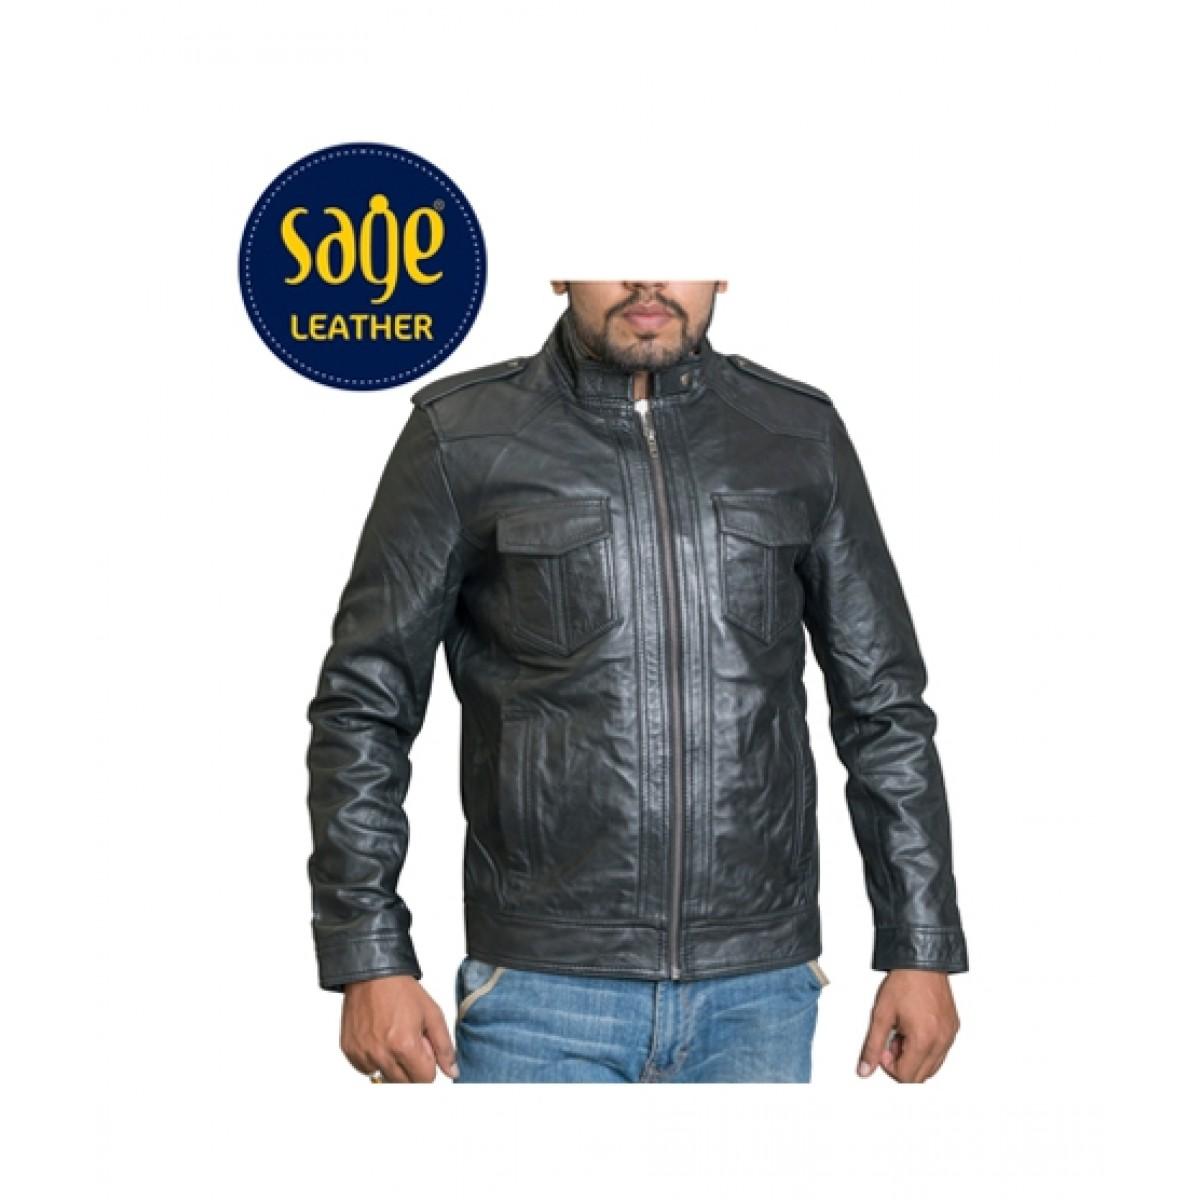 f13de79309d6 Sage Leather Jacket For Men Price in Pakistan | Buy Sage Leather Jacket For  Men Black (25071) | iShopping.pk